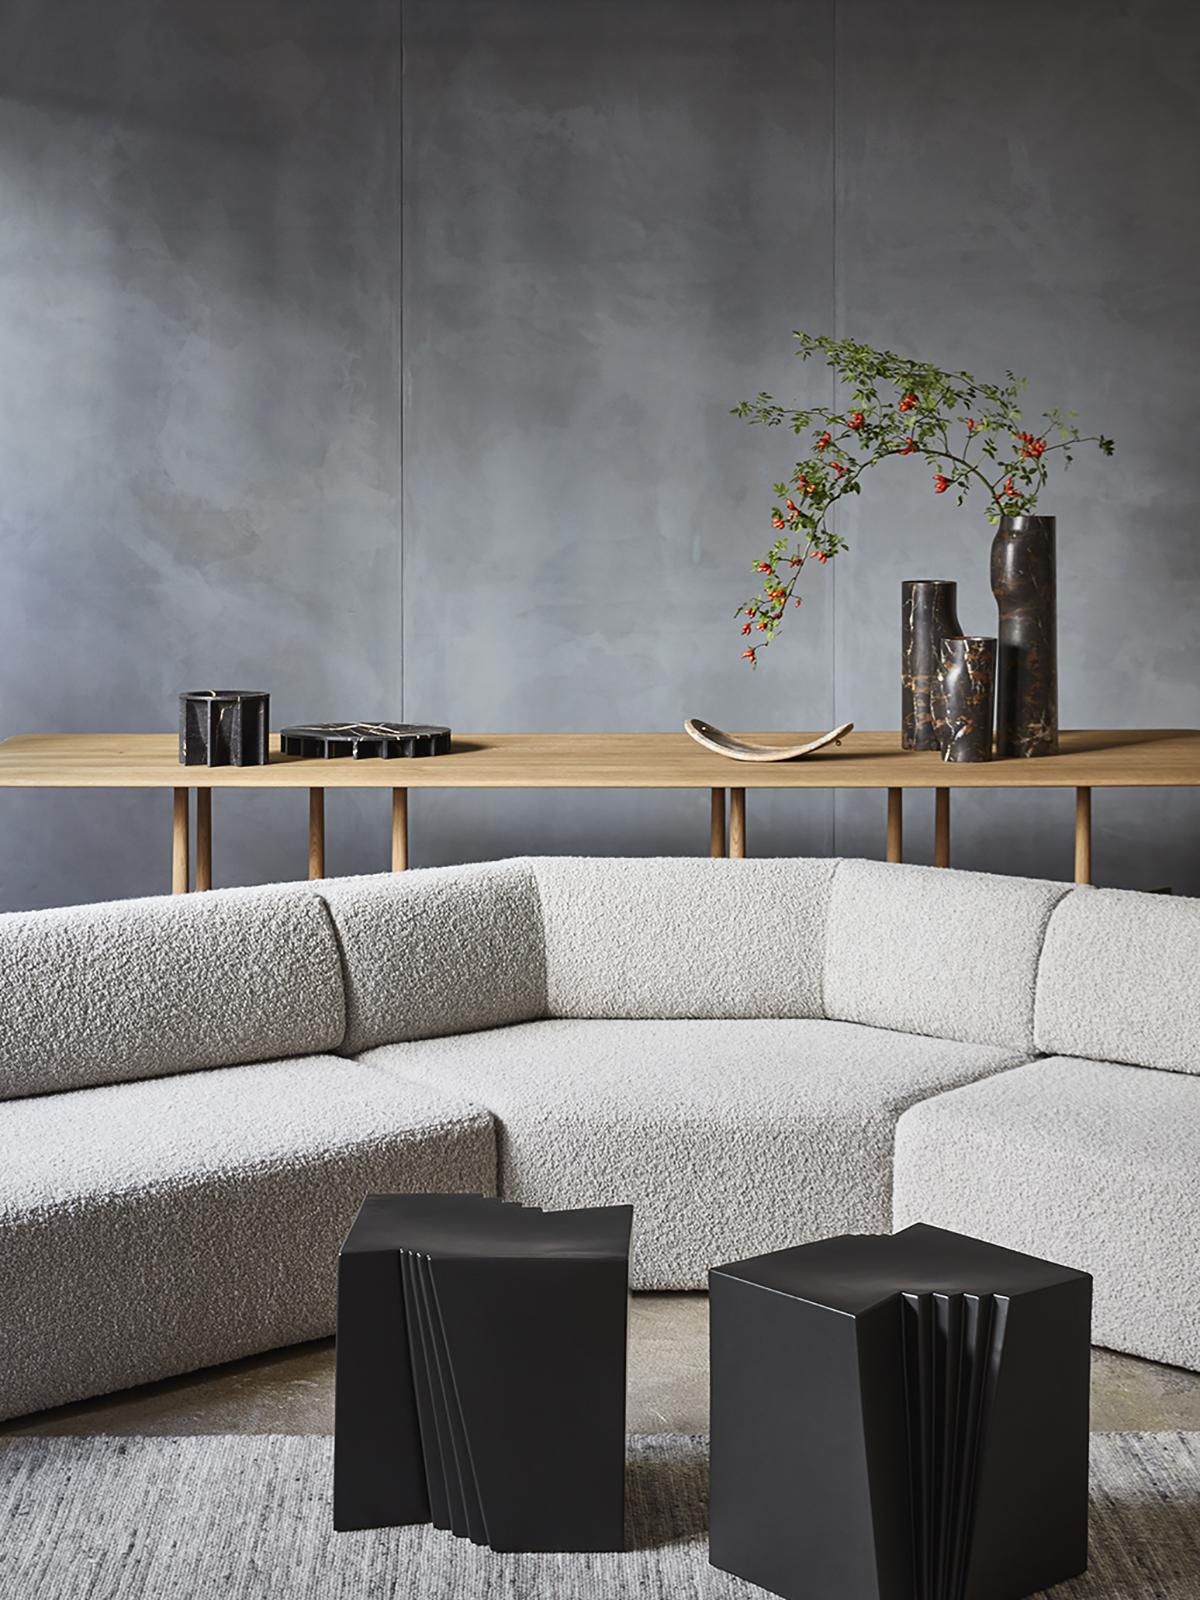 Declourt Collection - EKO sofa - SIN side table - TYE table